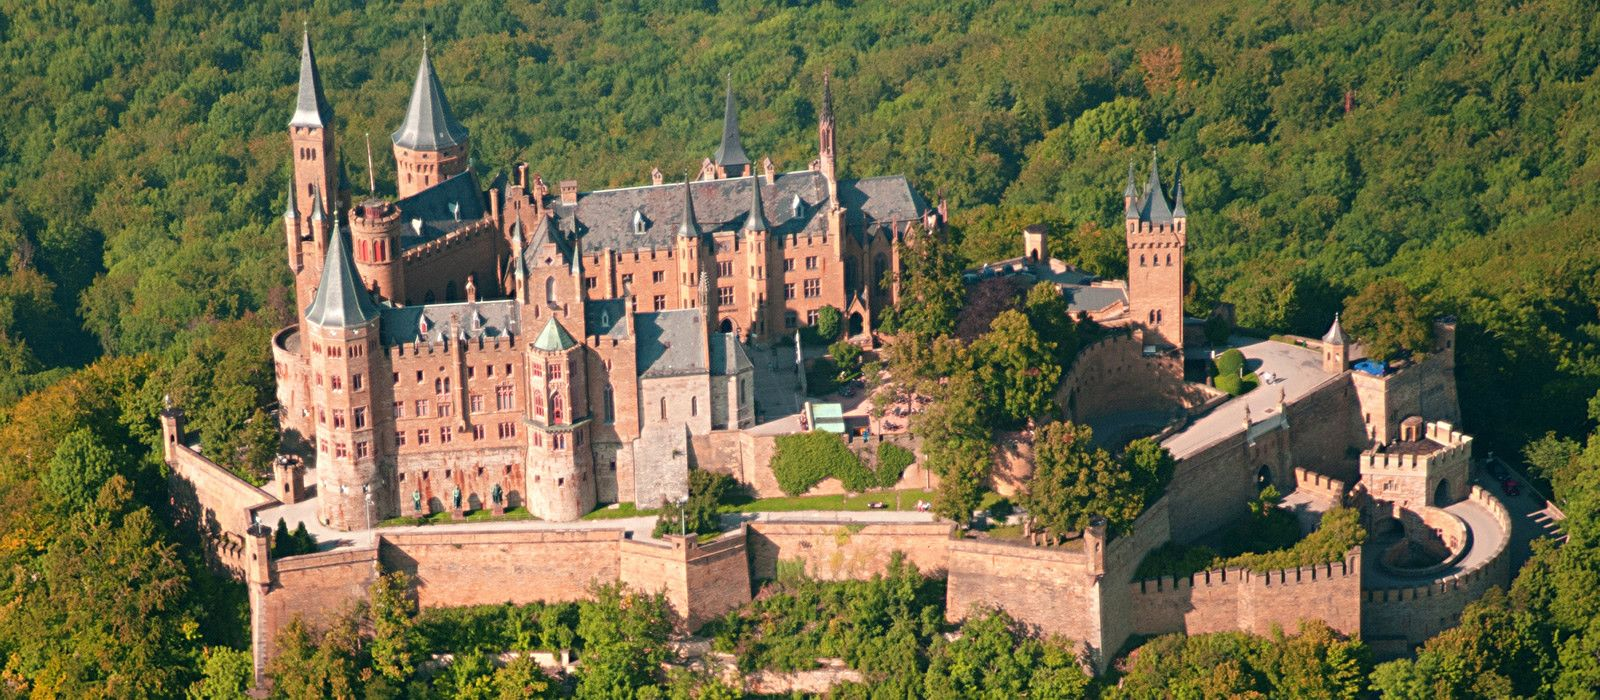 Http Www Hohenzollern Urlaub De Wp Content Uploads 2014 04 Burg Hohenzollern 1600x700 Jpg ドイツ